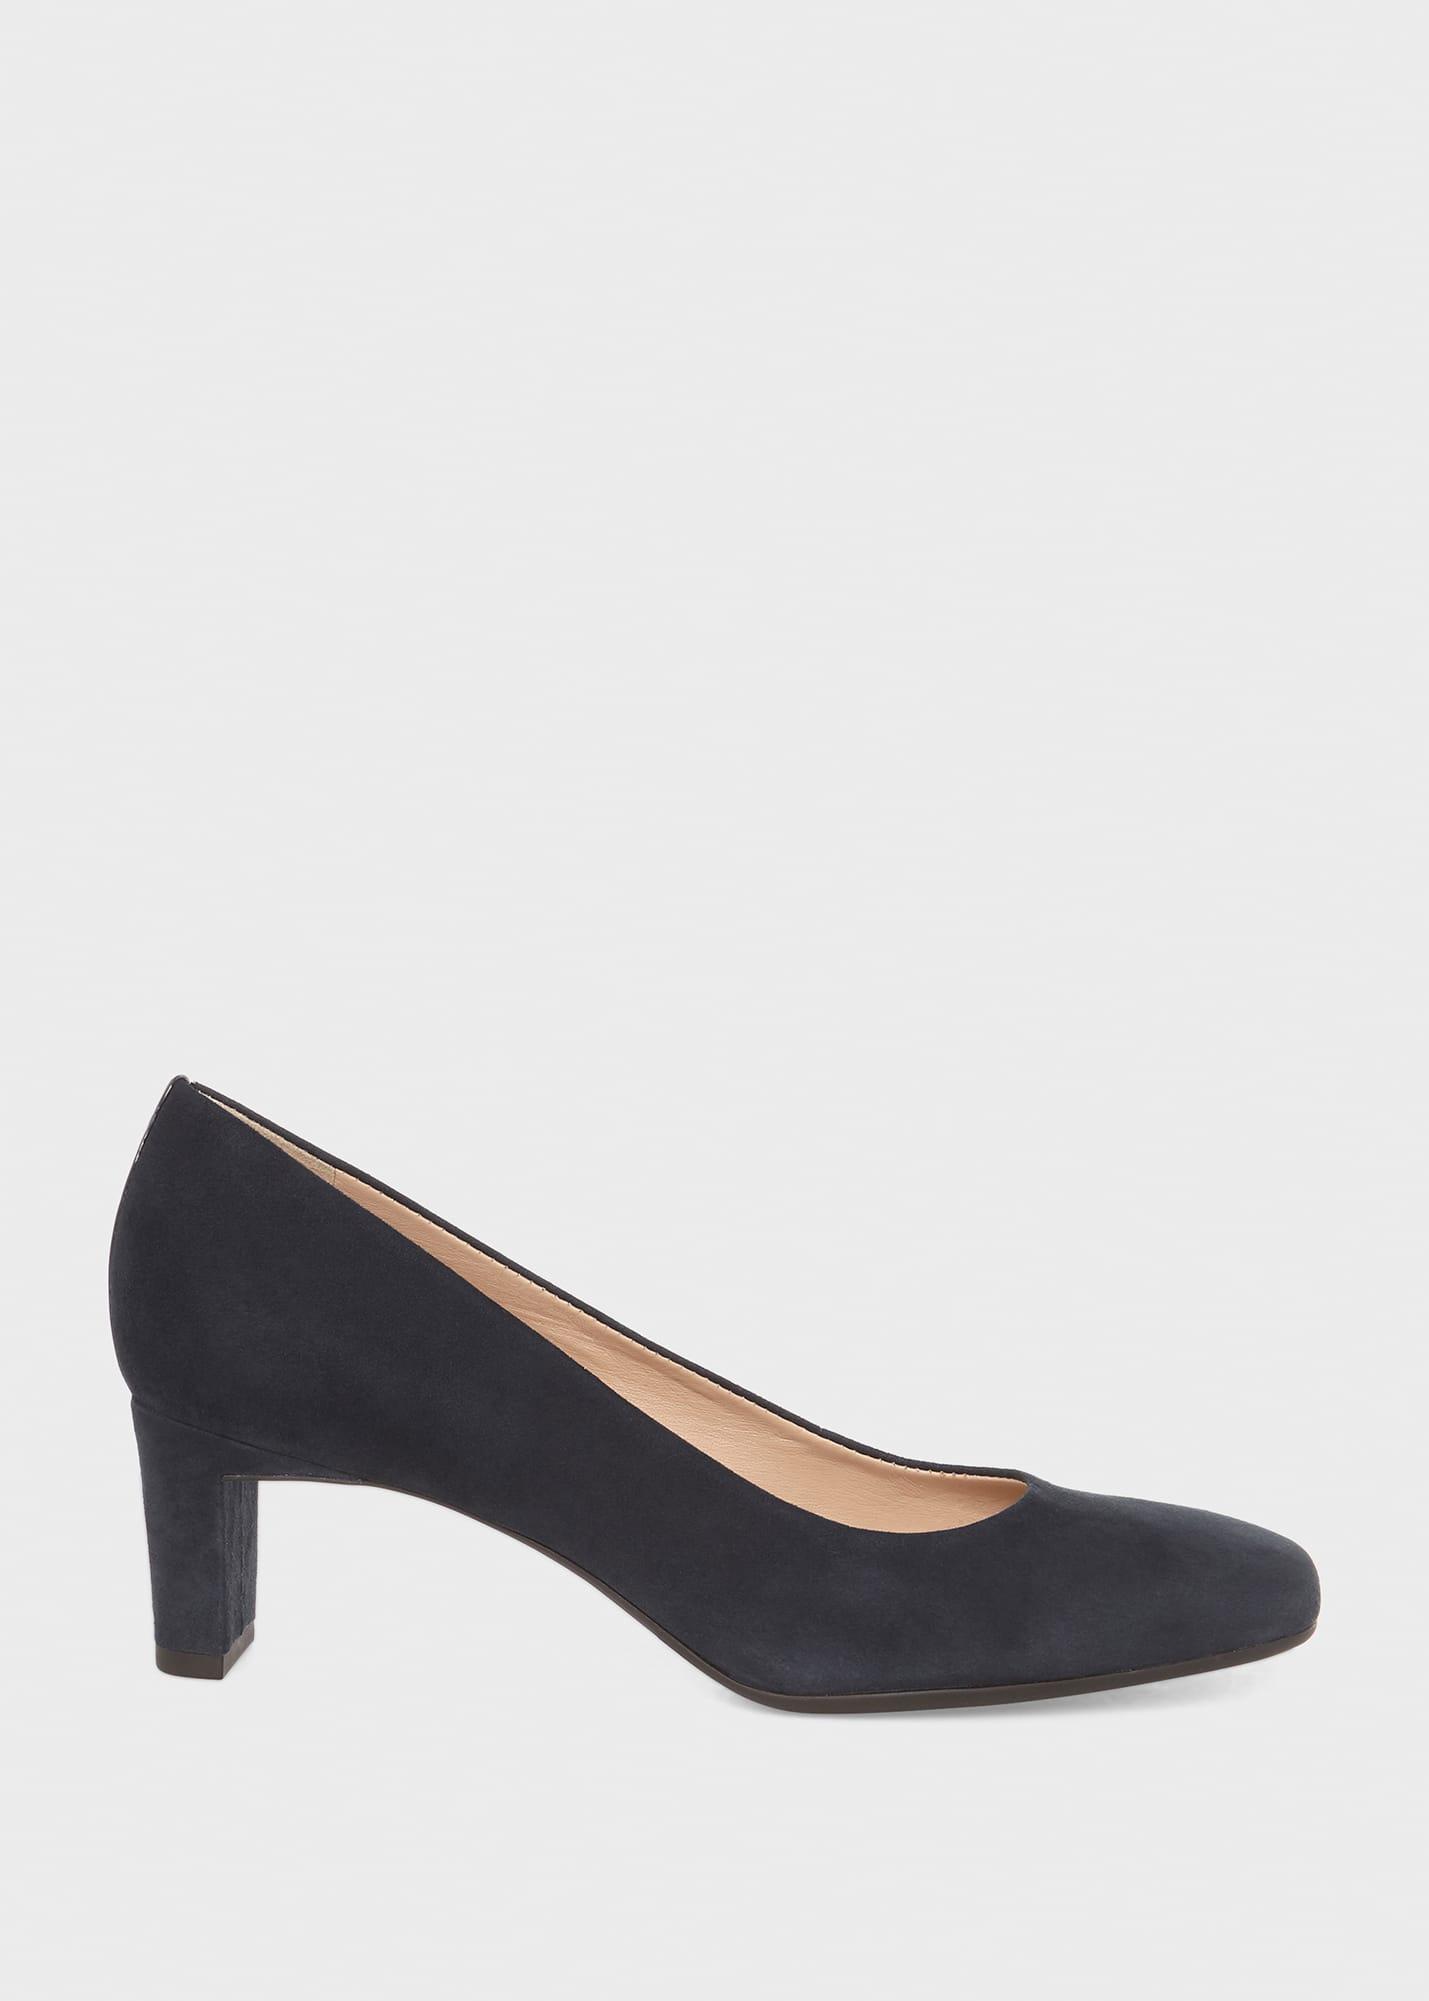 Hobbs Women Myra Suede Court Shoes